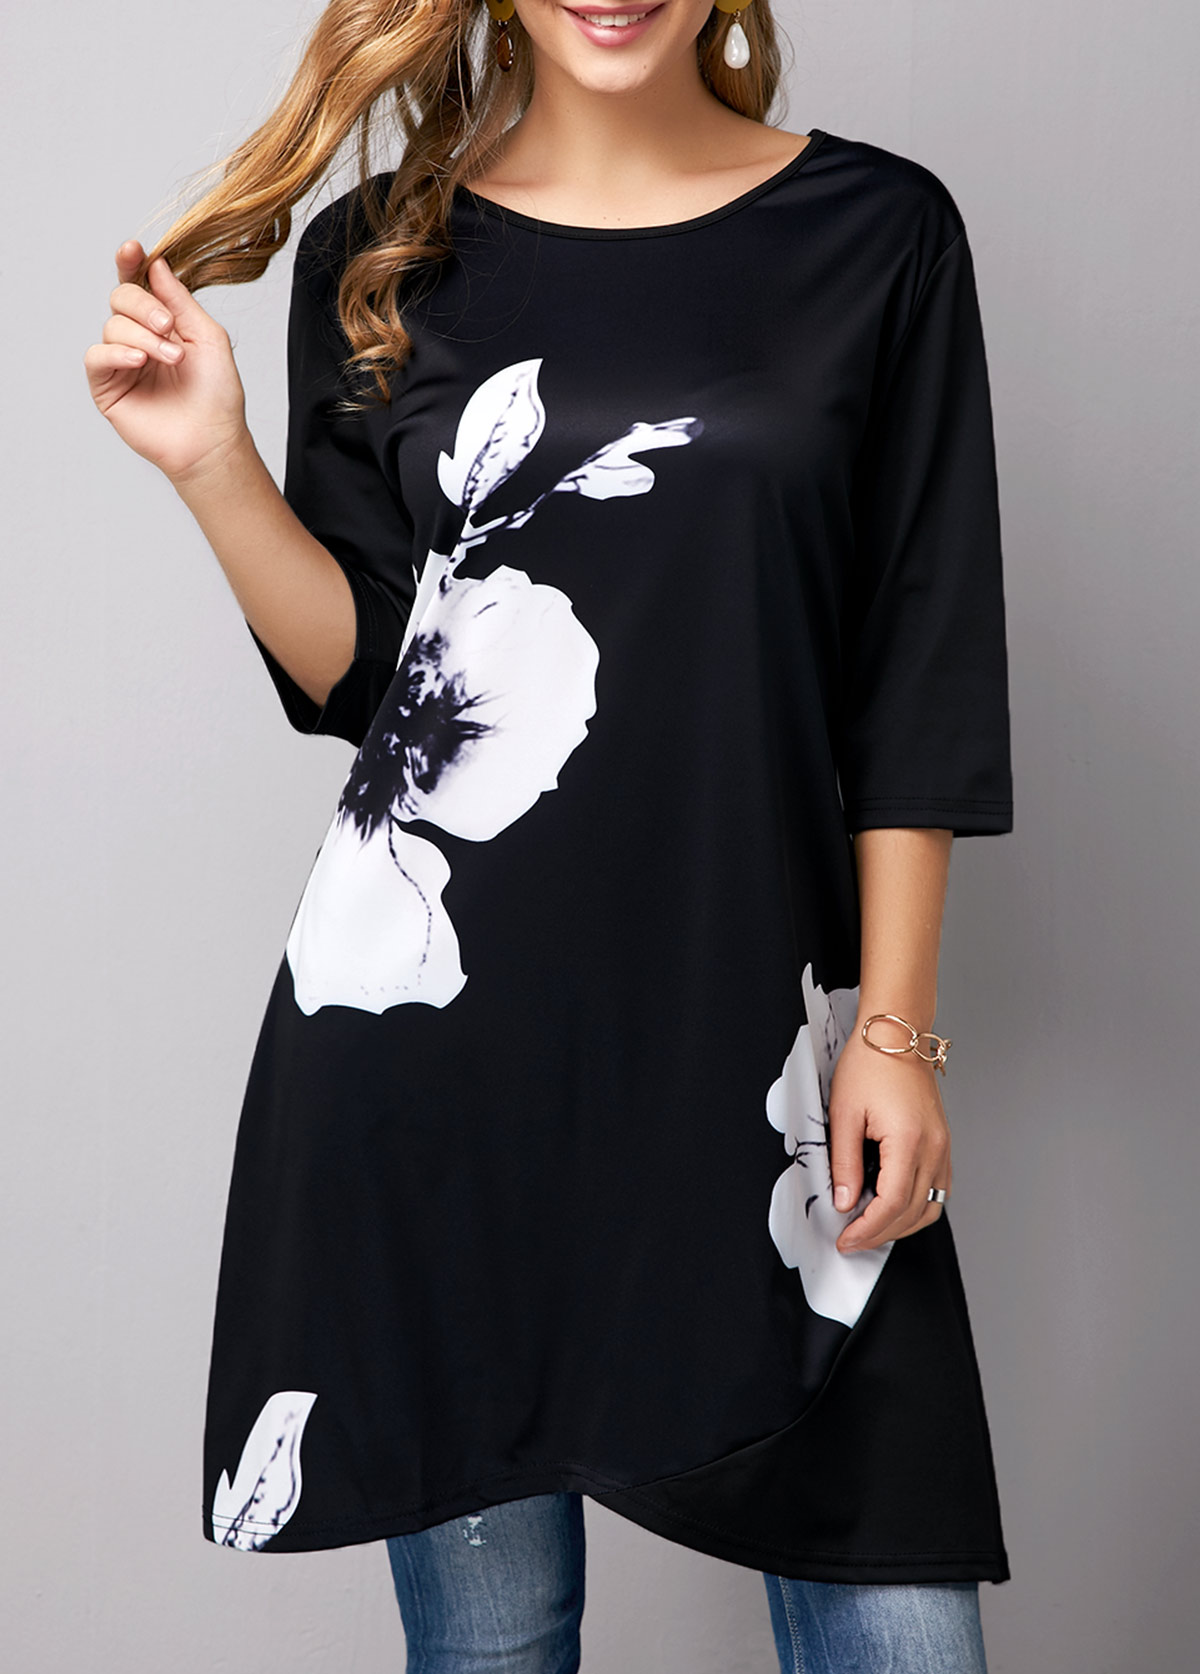 Crossover Hem Flower Print T Shirt